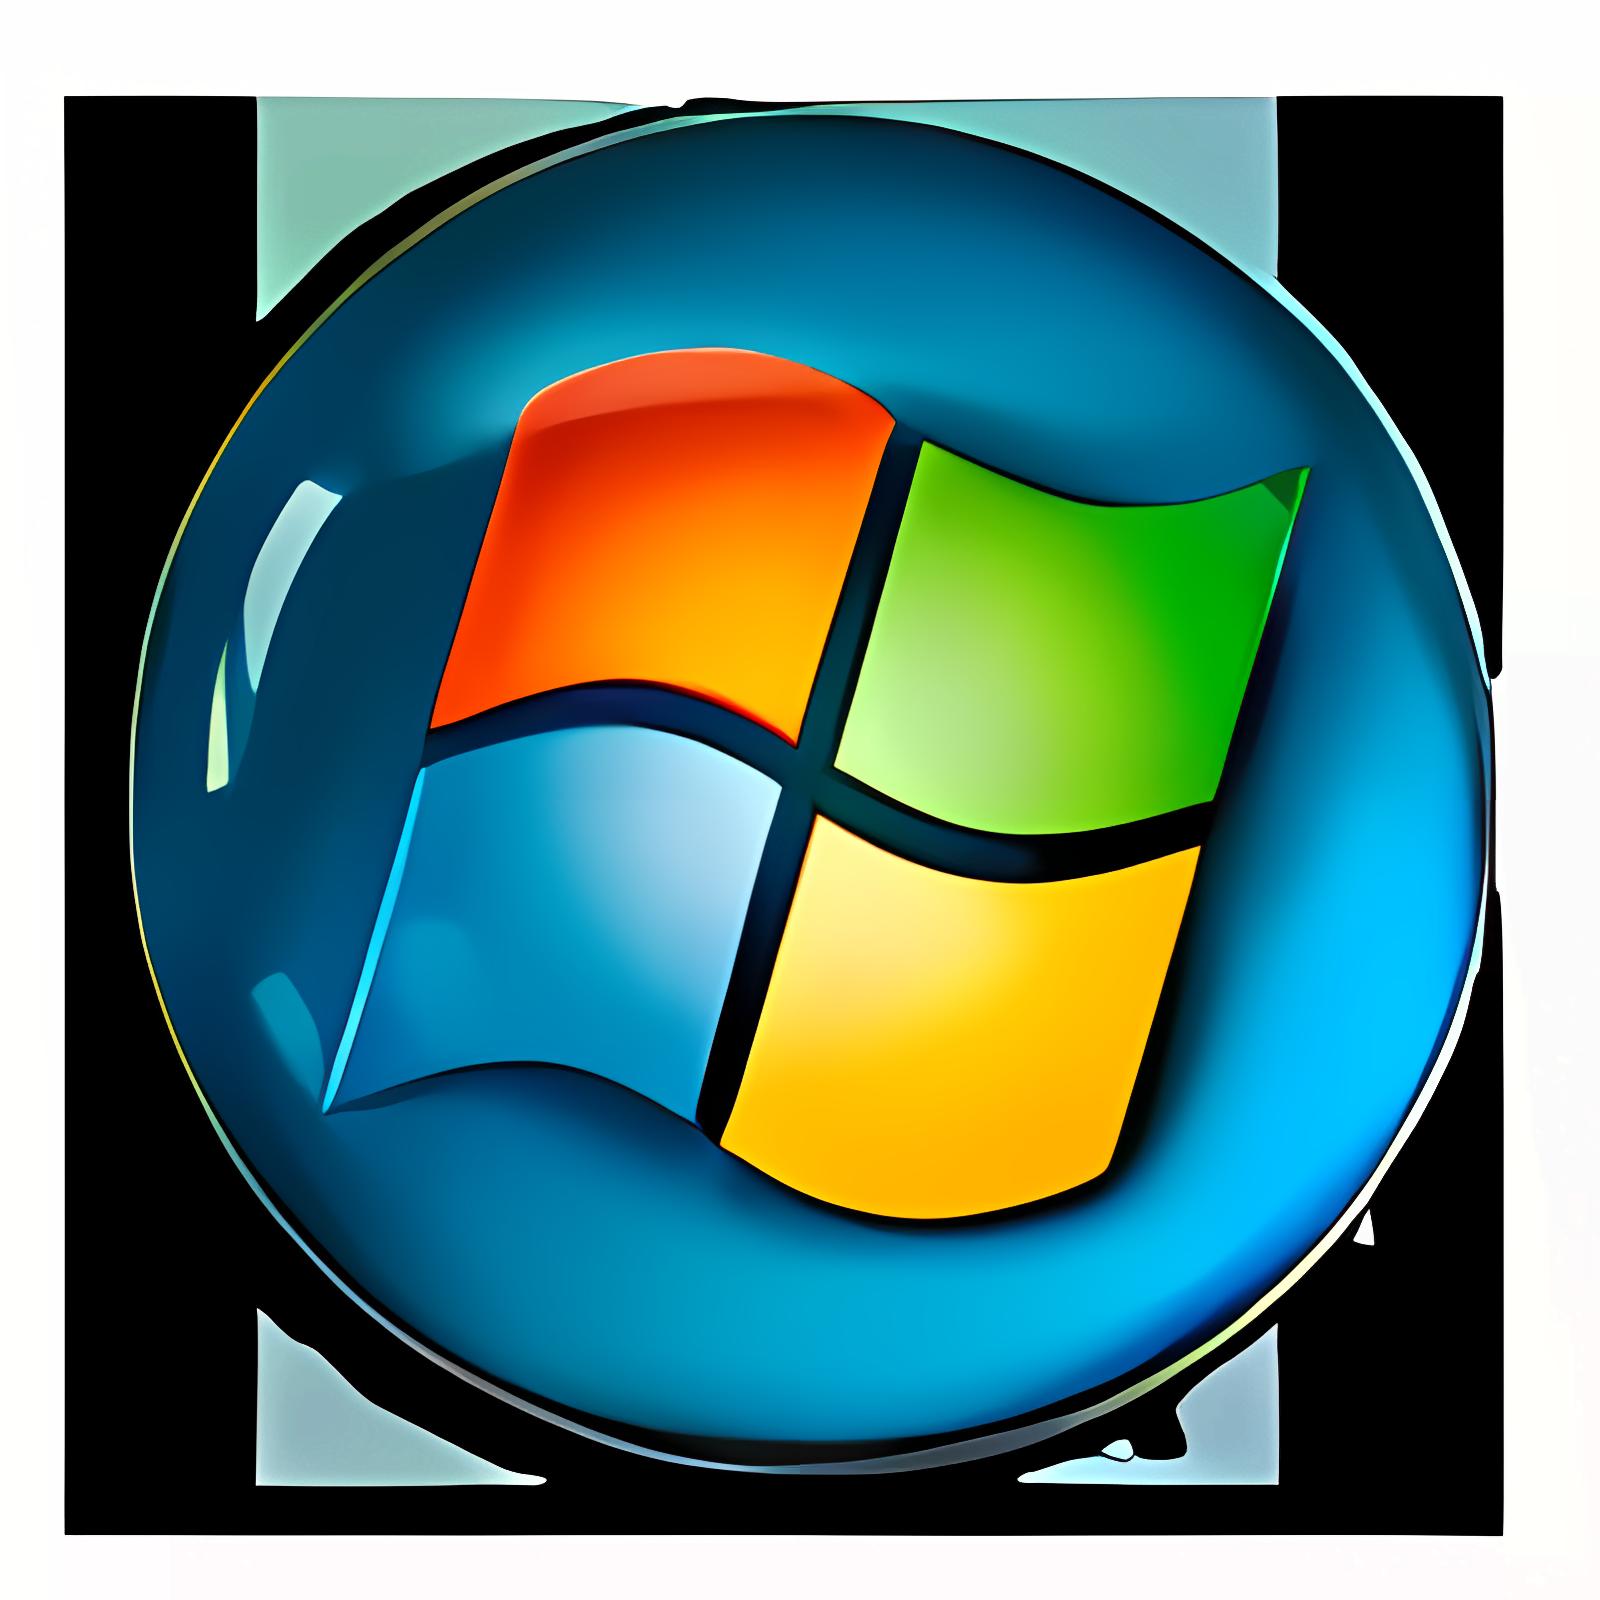 ViStart 8.0.0.4040